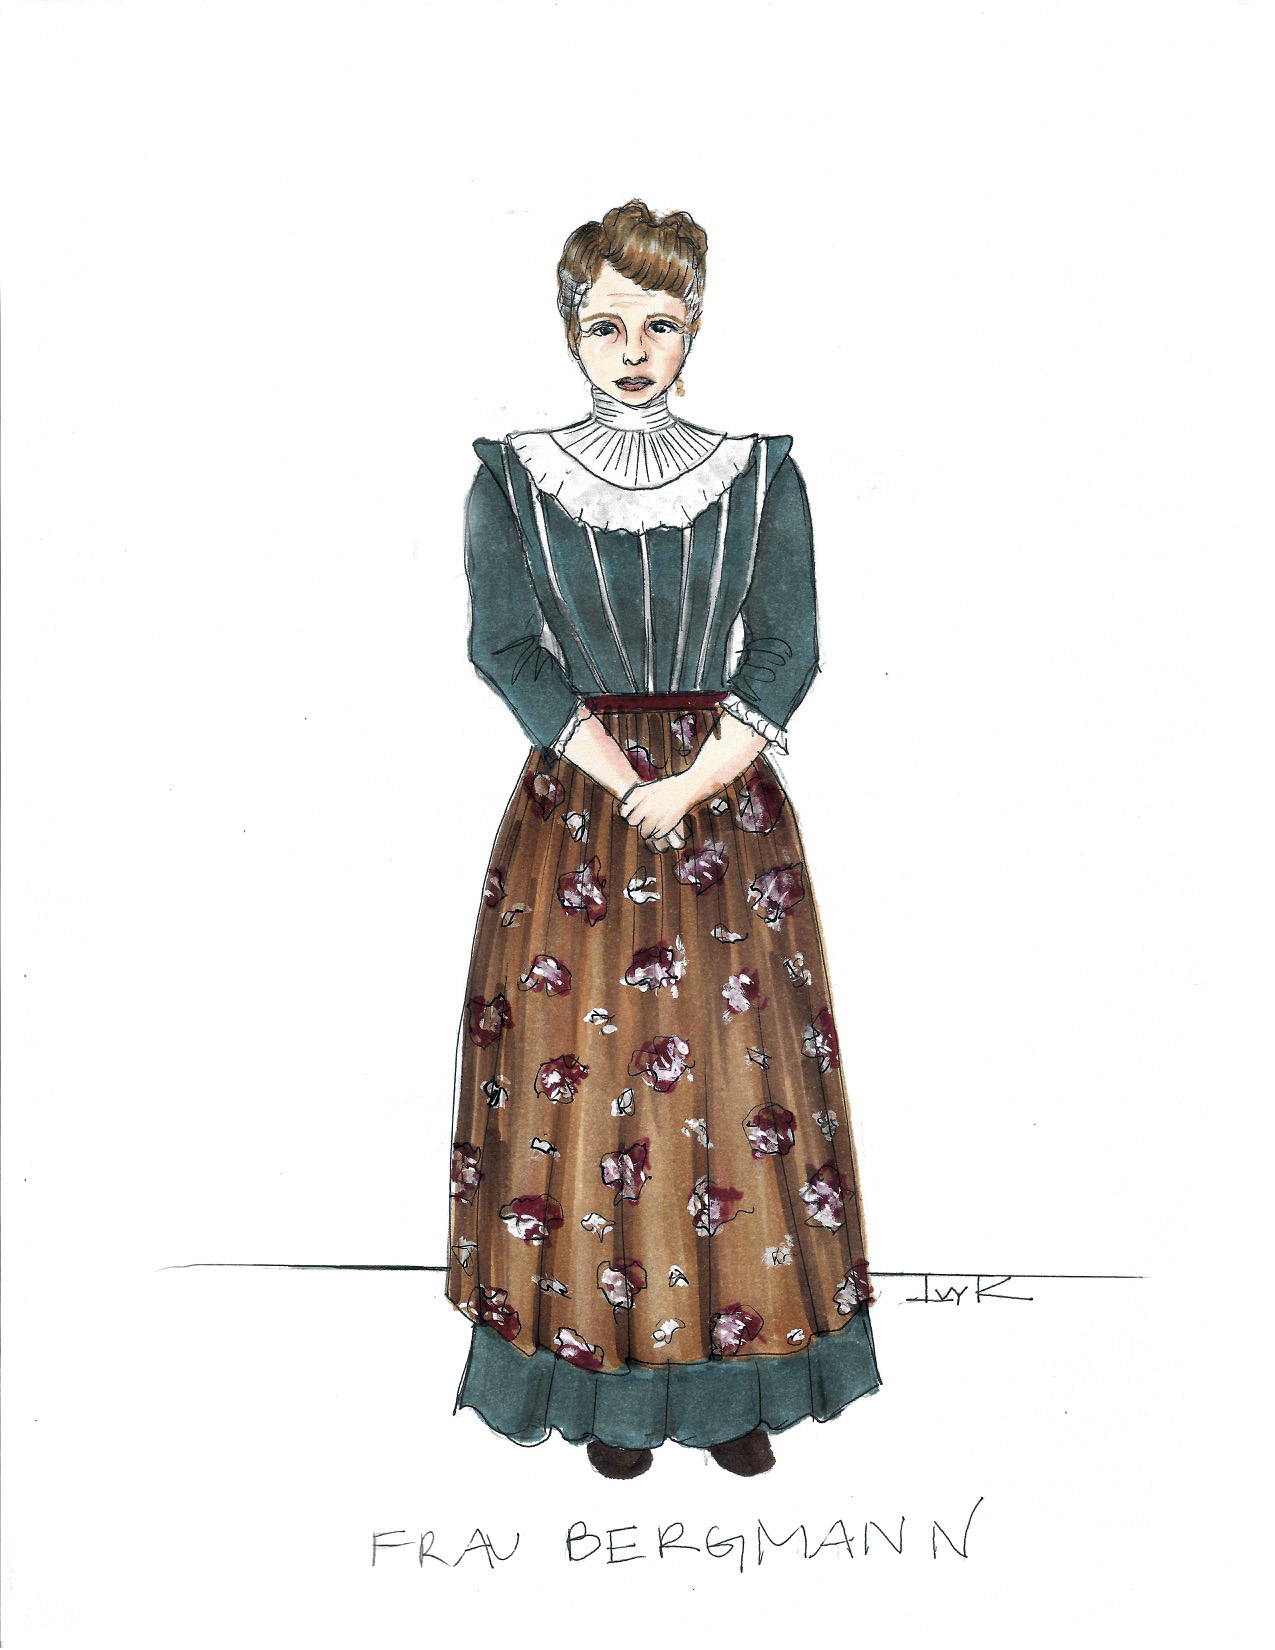 Frau Bergmann